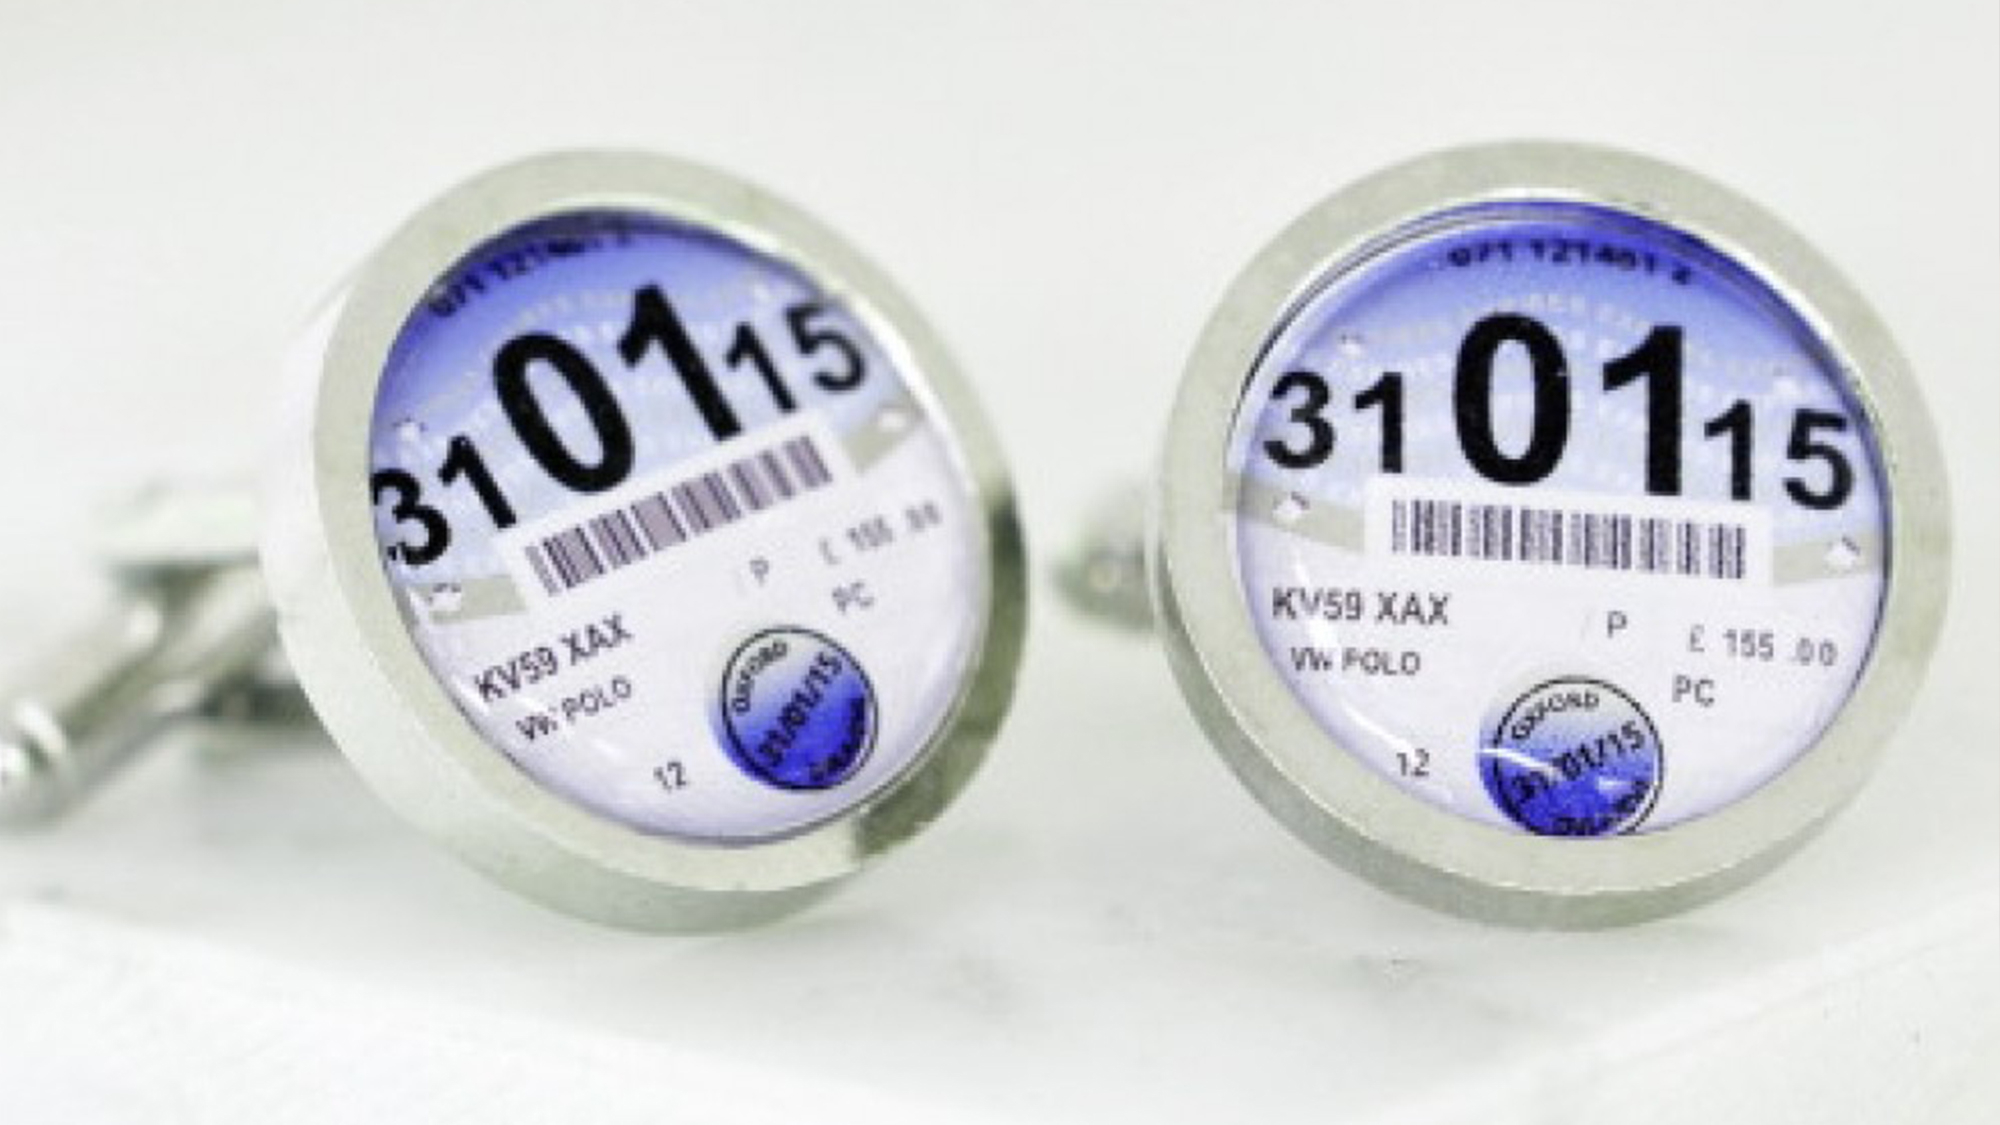 Tax disc cufflinks